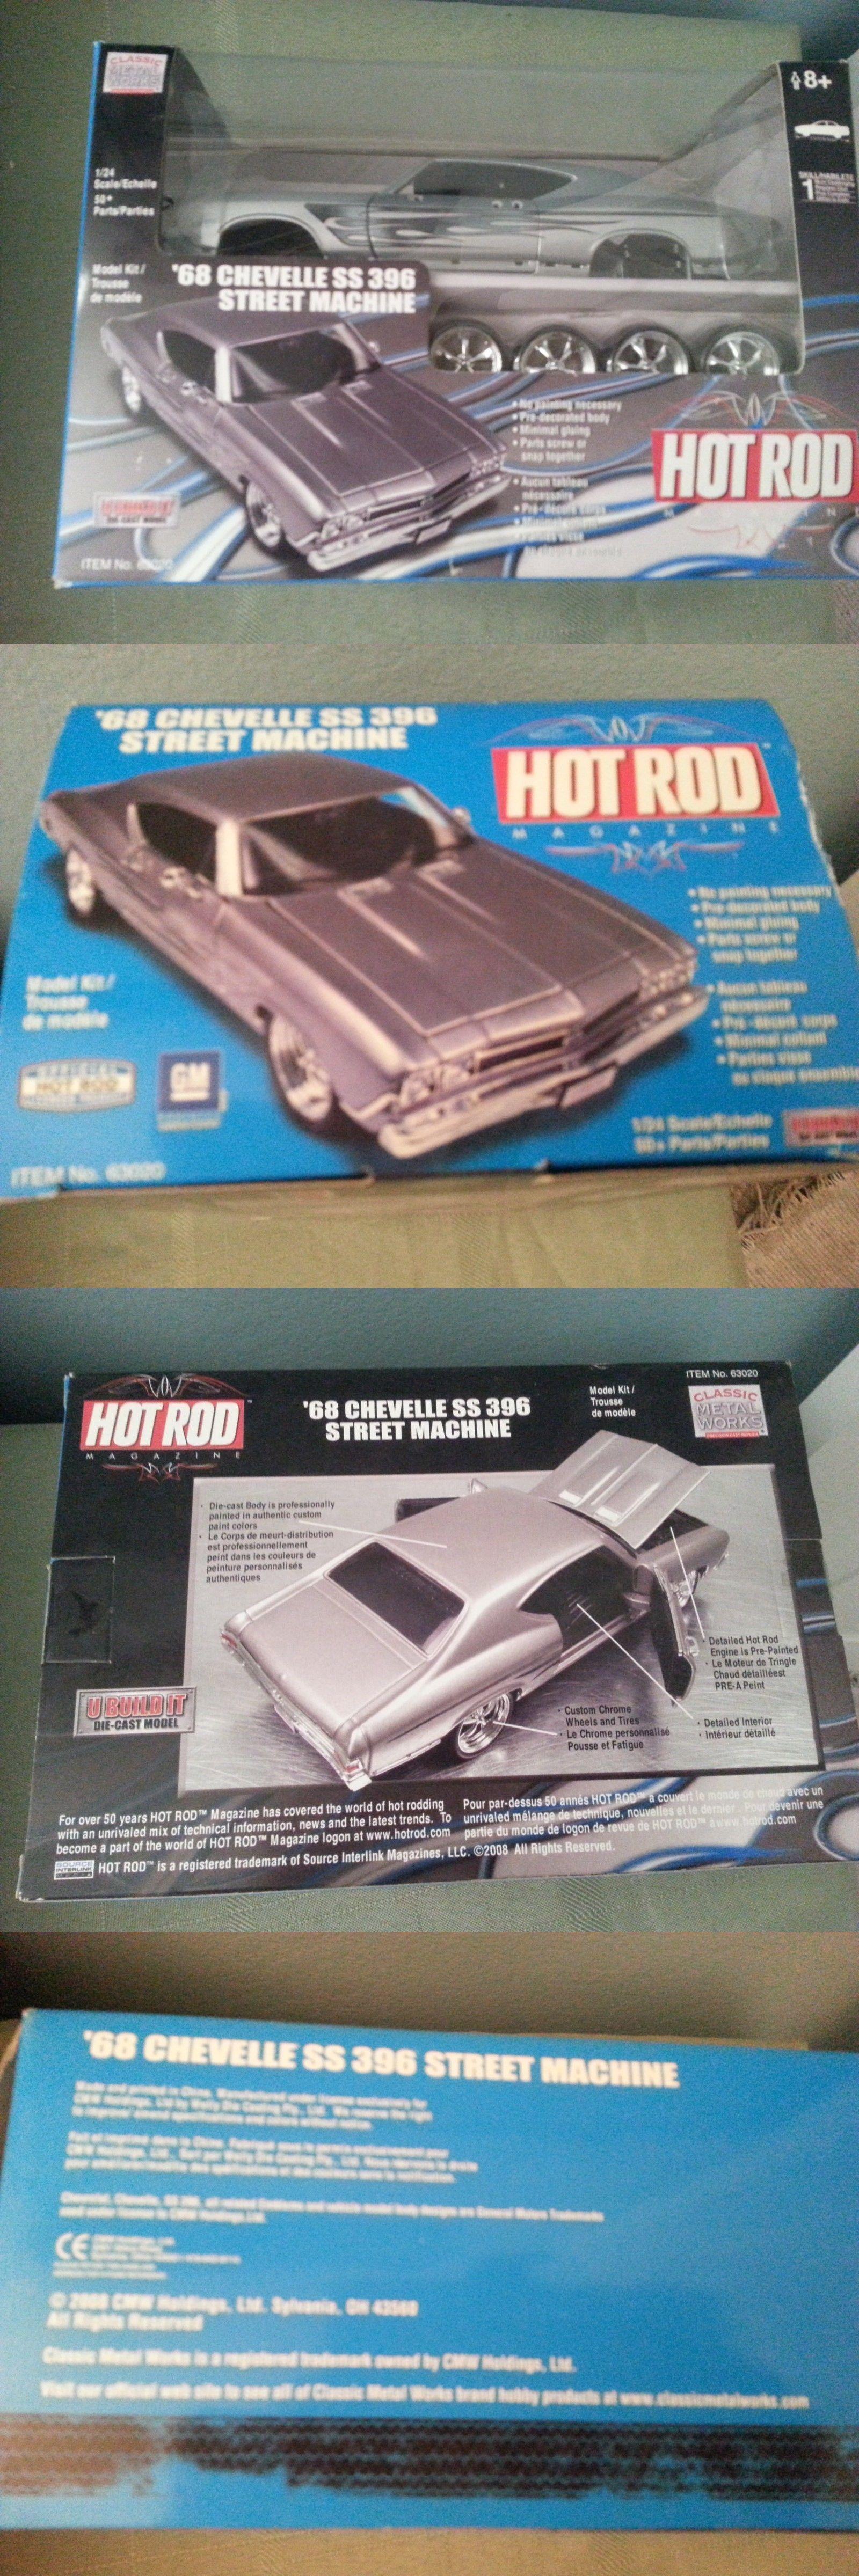 Hot Rod 2582: 1968 Chevelle Ss 396 Street Machine Hot Rod Magazine 1 ...